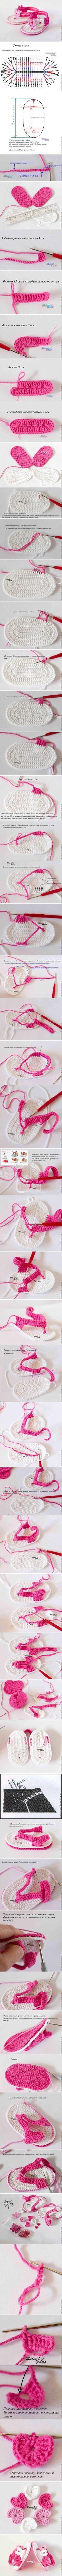 DIY Adorable Crochet Baby Sandals | iCreativeIdeas.com LIKE Us on Facebook ==> https://www.facebook.com/icreativeideas